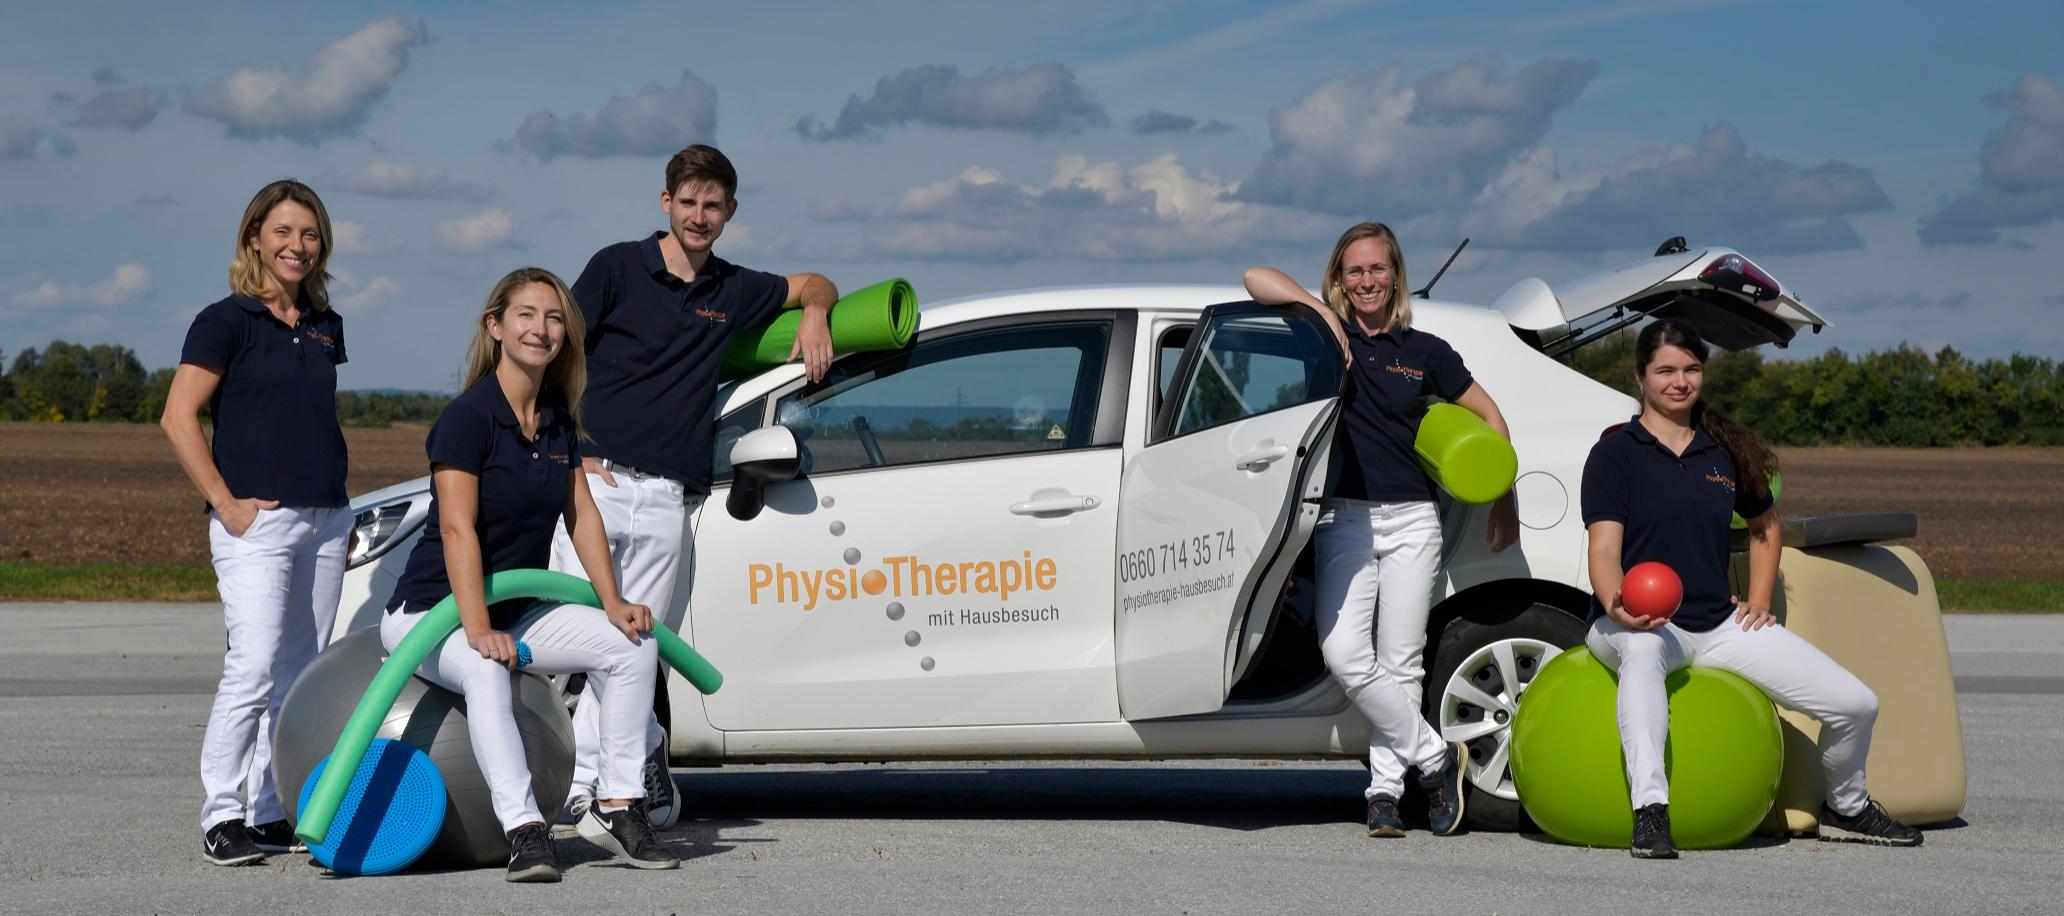 Physiotheapie Team Hausbesuche 1A kl_edi